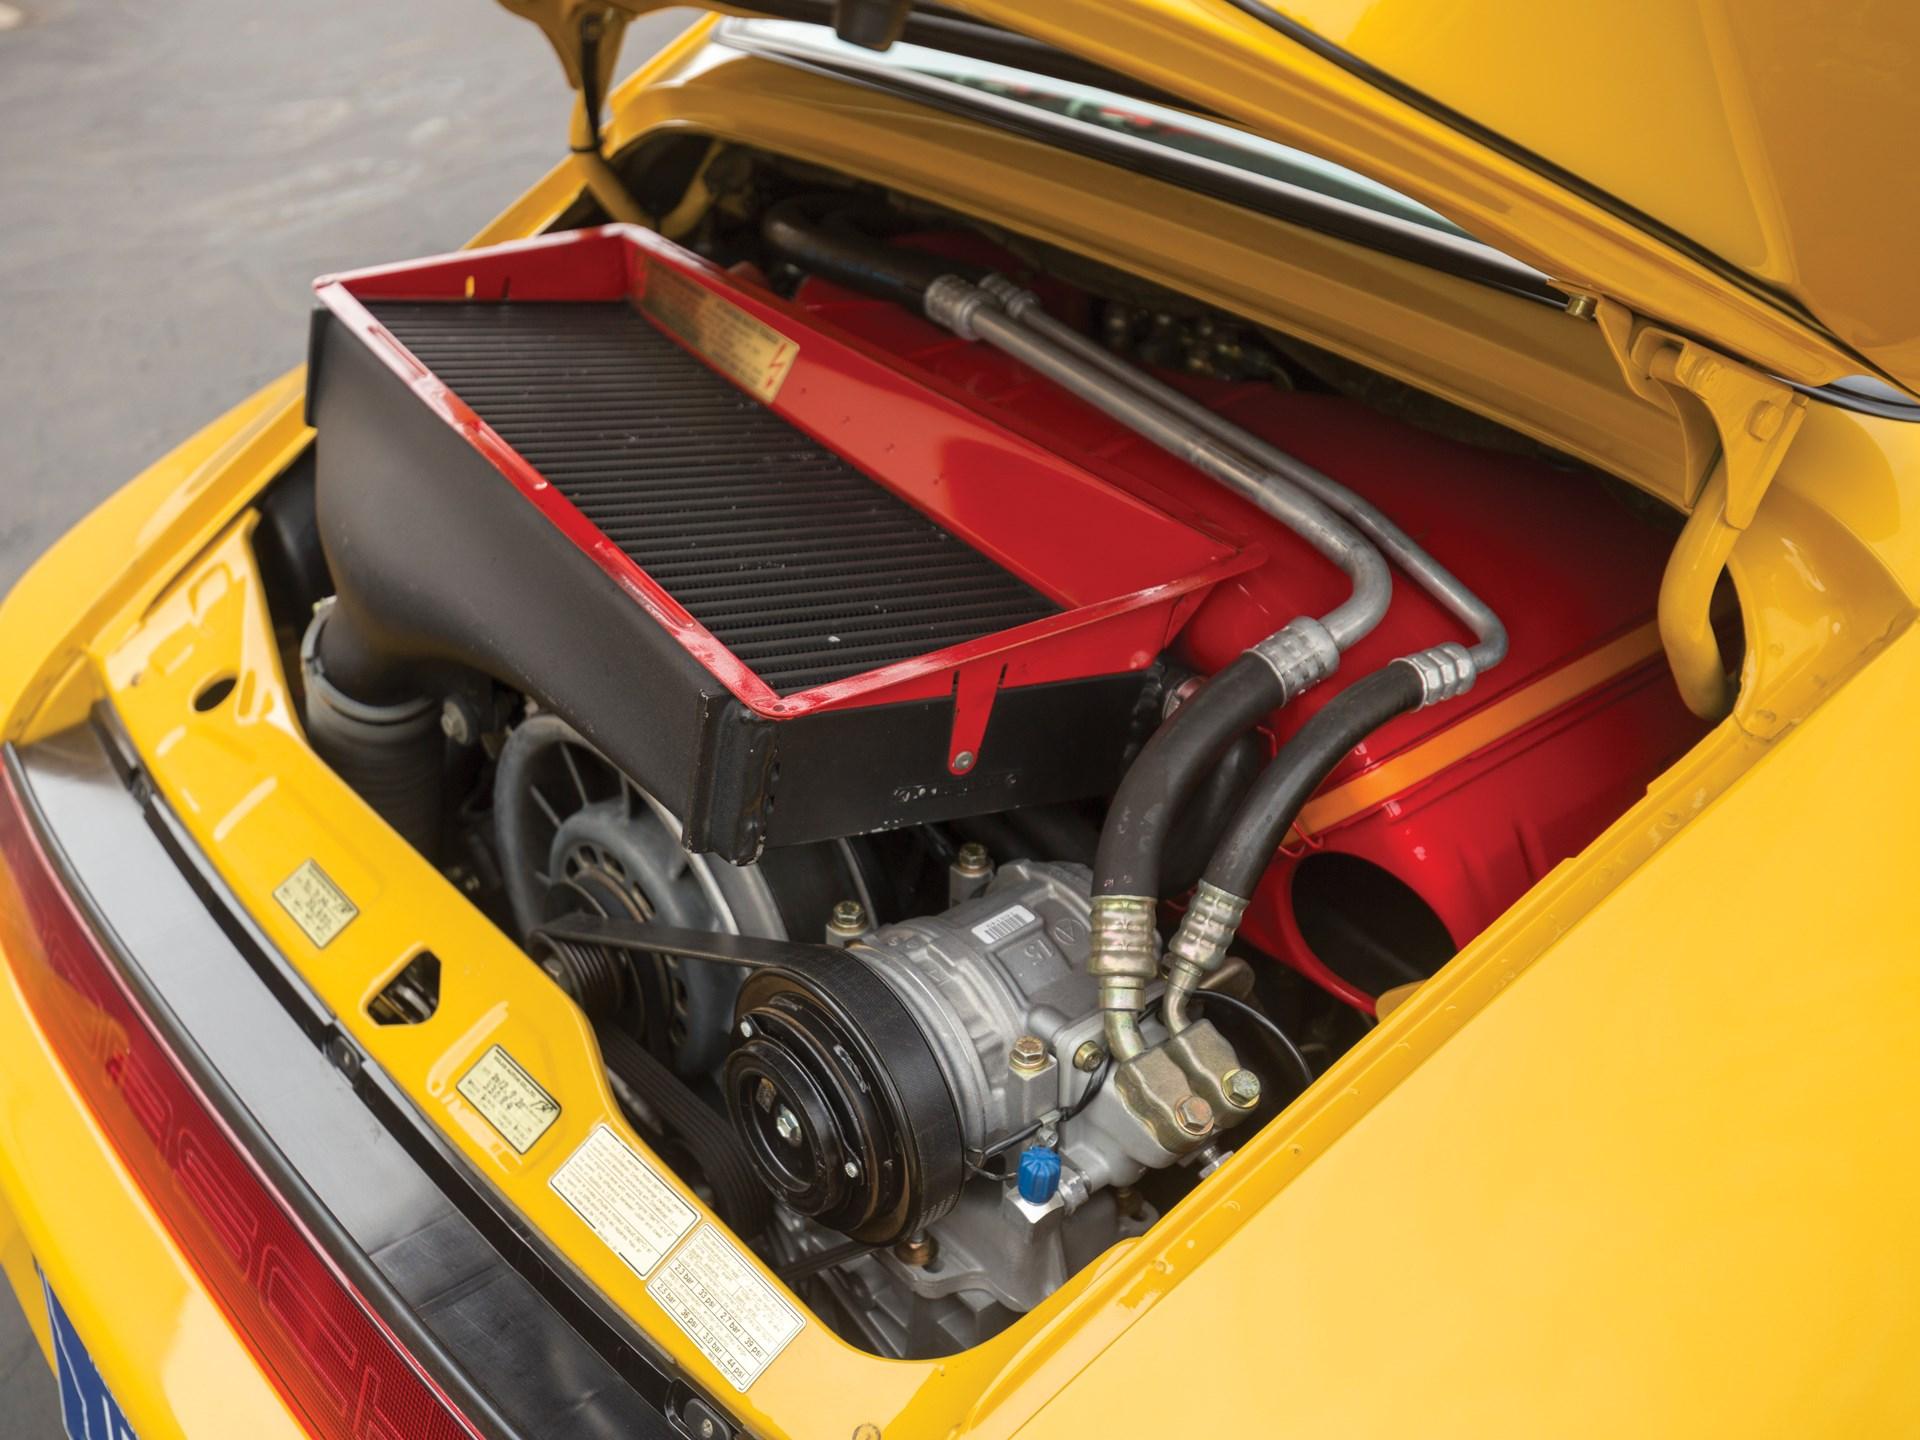 1993 Porsche 911 Turbo S 'Leichtbau'